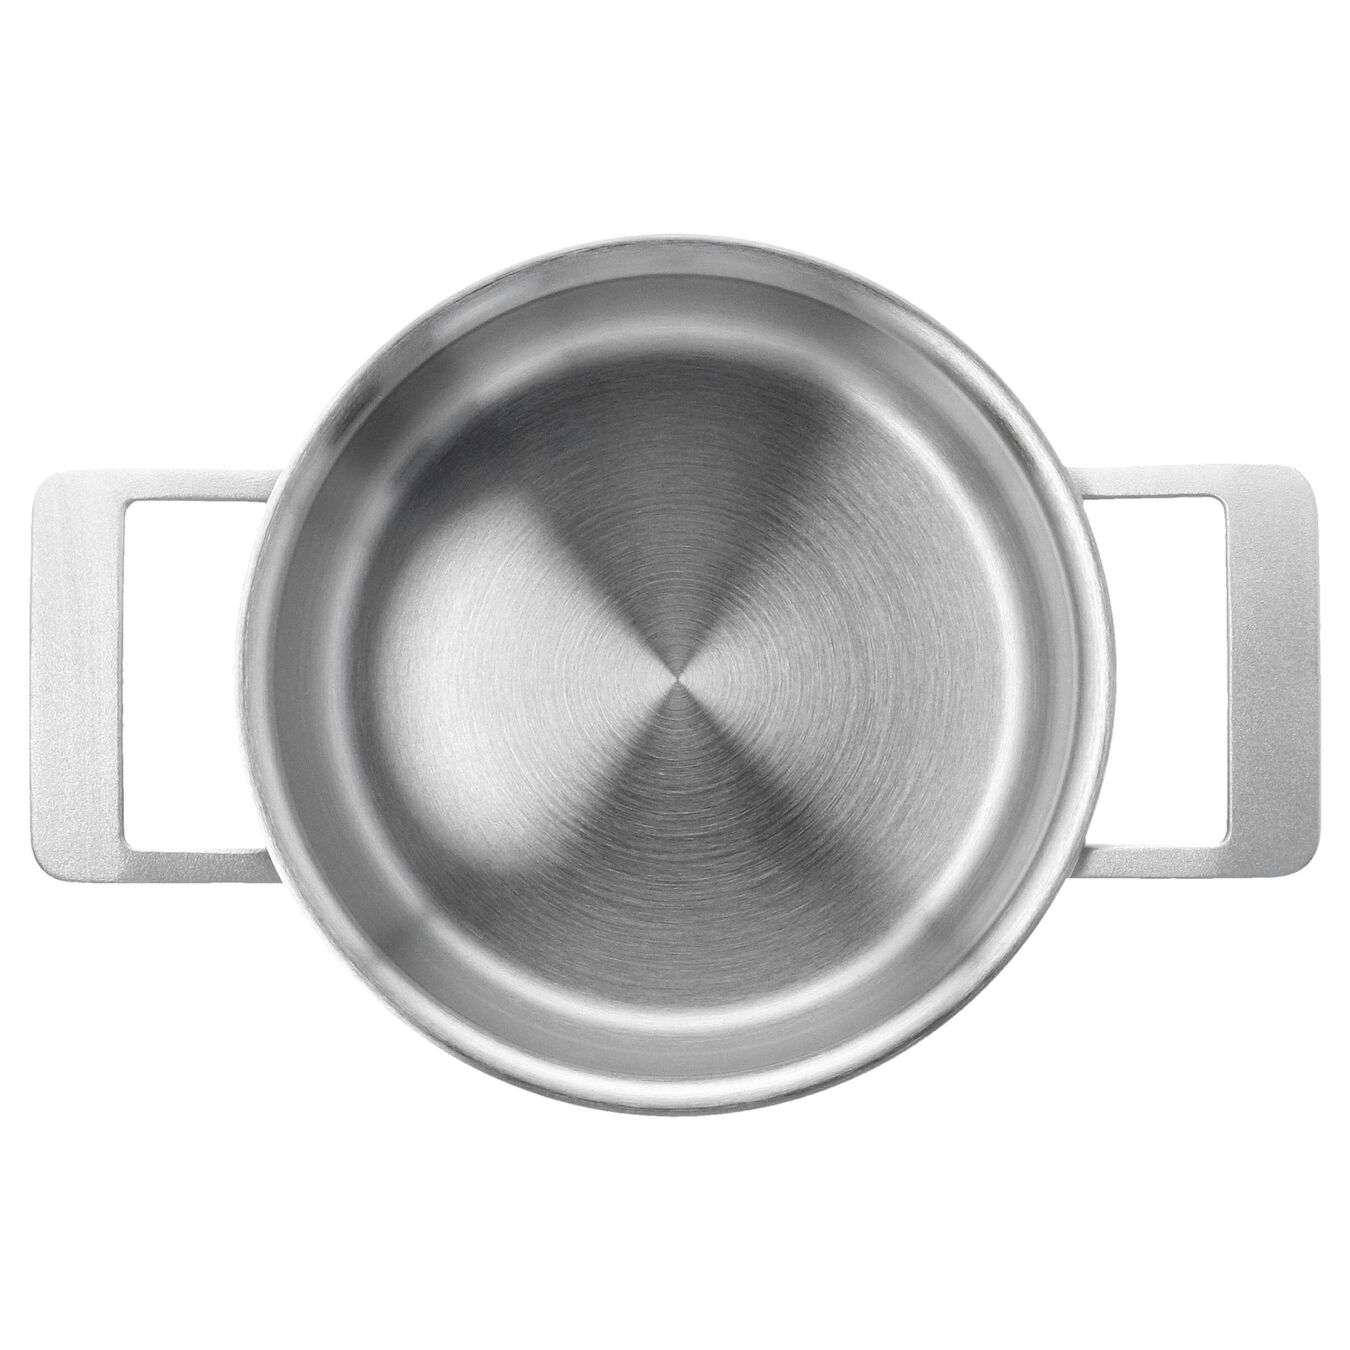 Casseruola con coperchio - 18 cm, 18/10 Acciaio inossidabile,,large 5